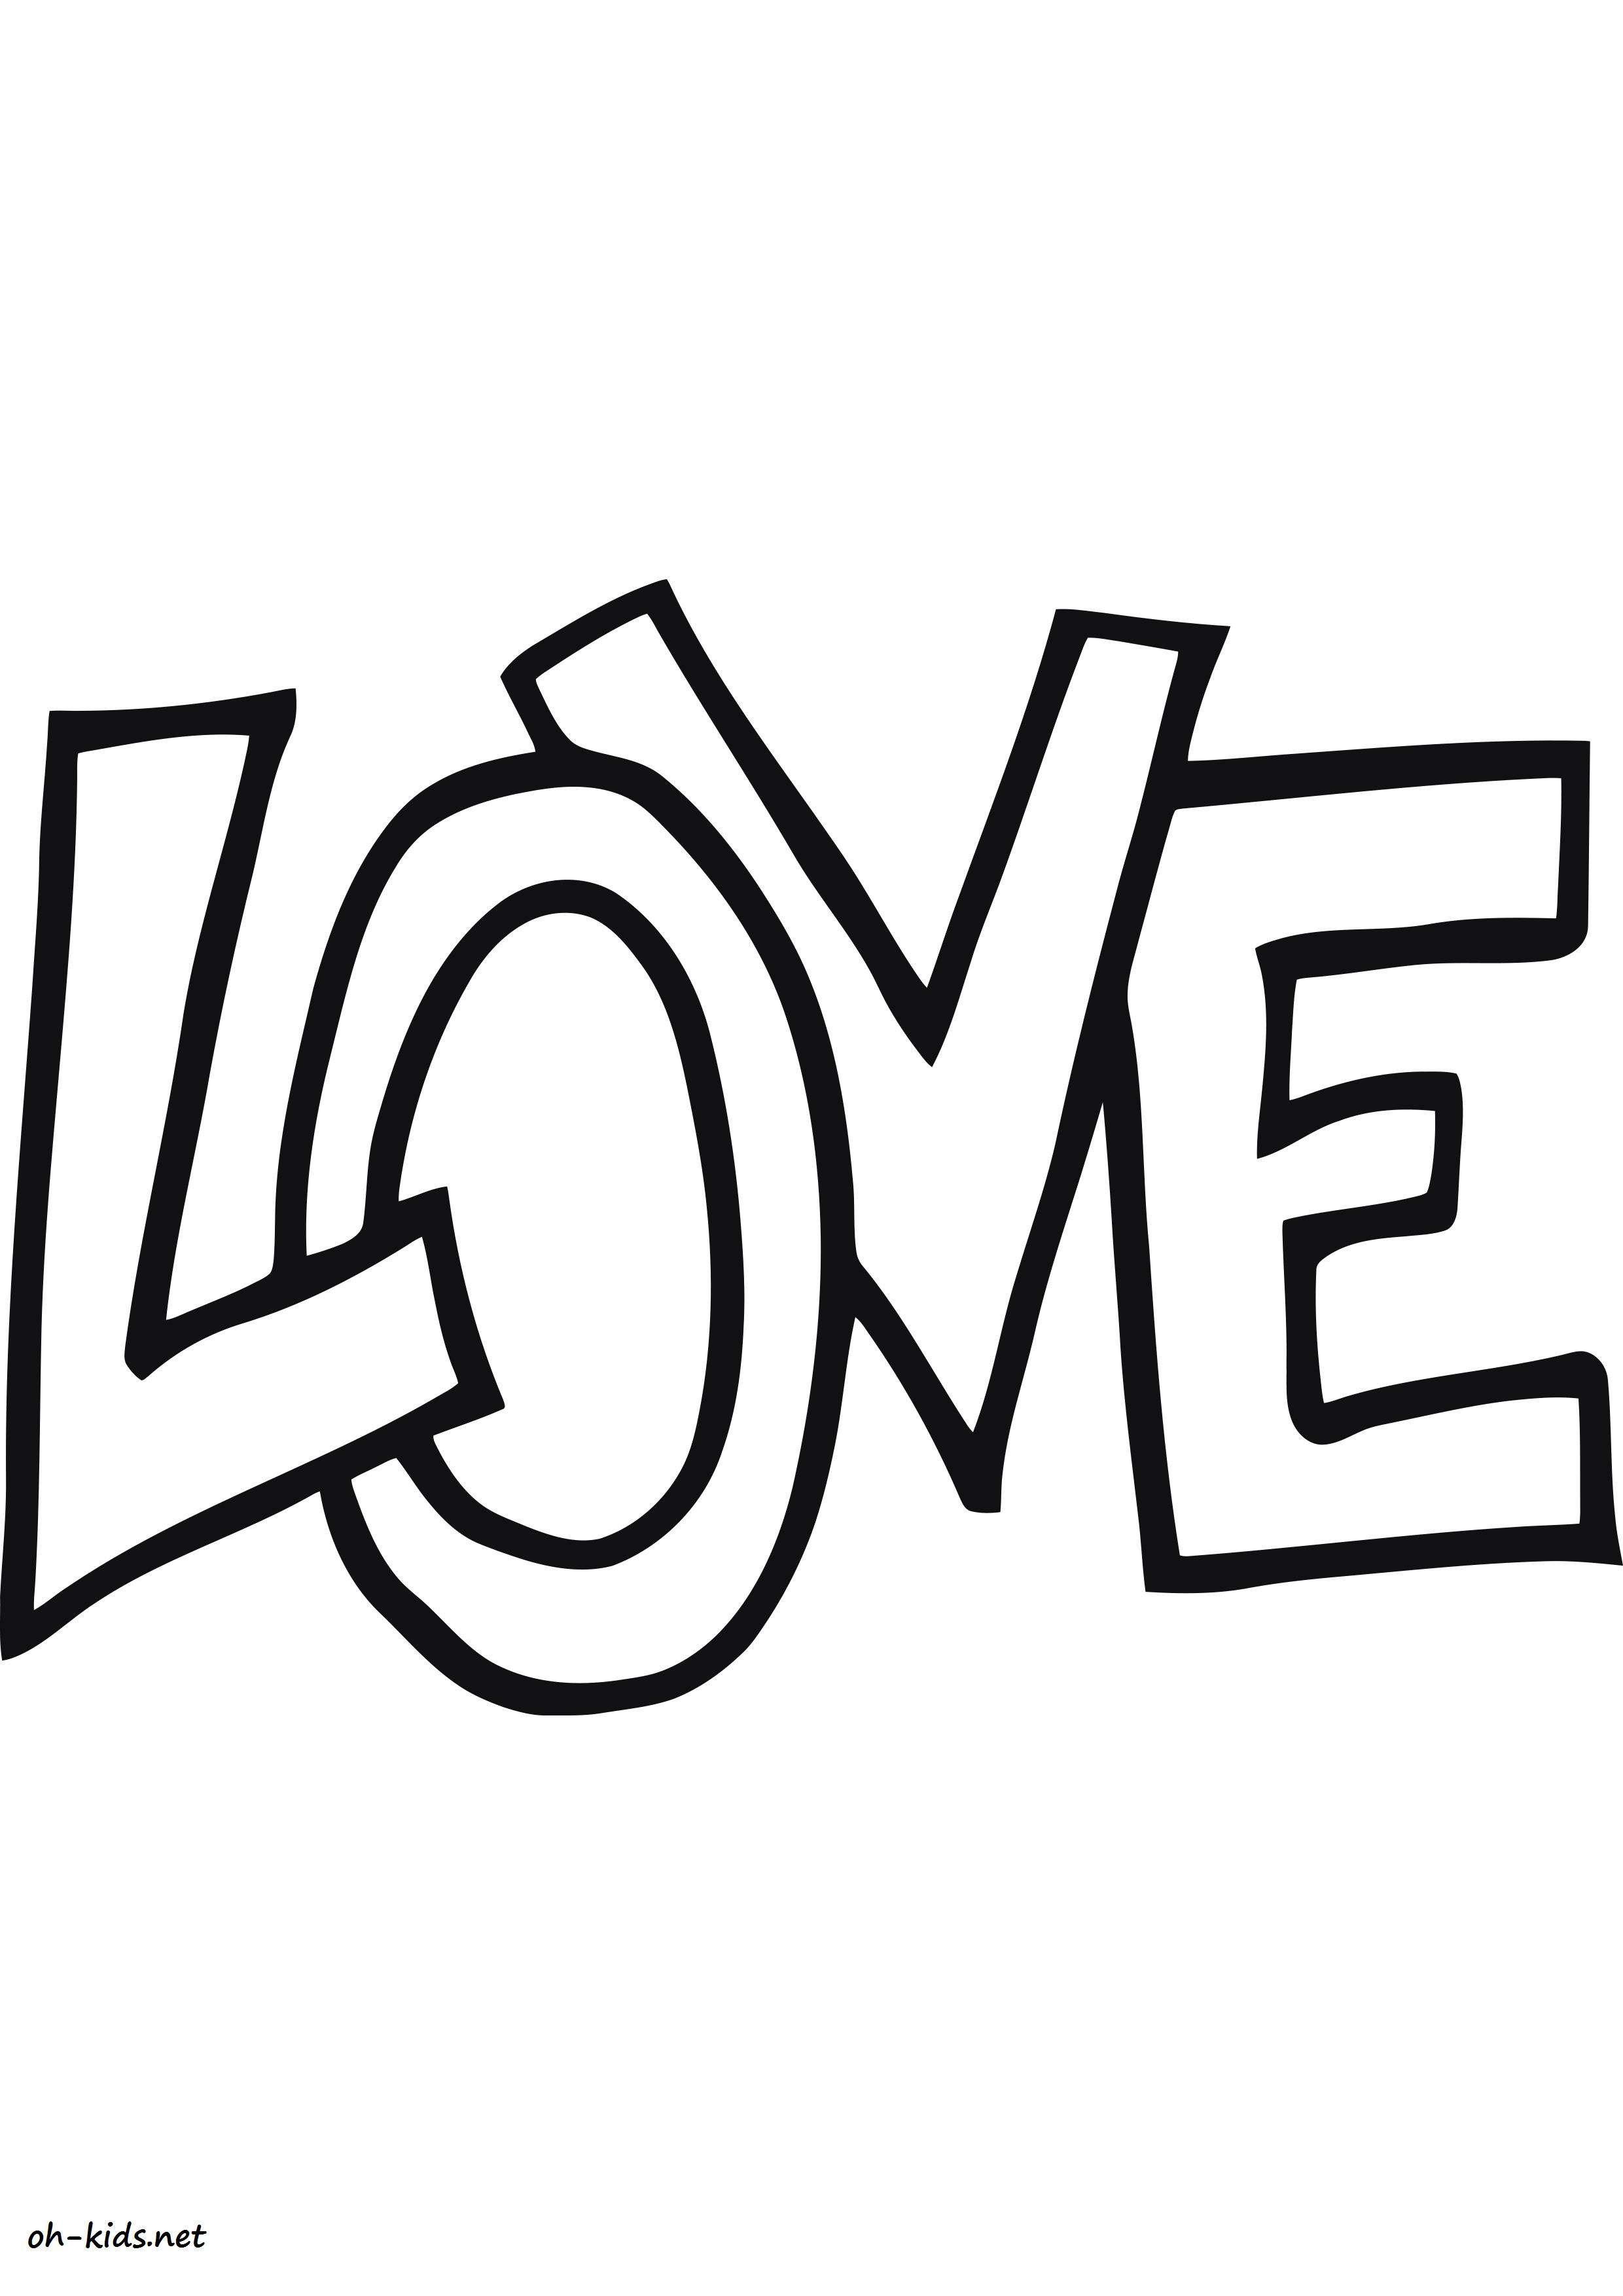 Dessin 770 Coloriage Tag Love à Imprimer Oh Kidsnet